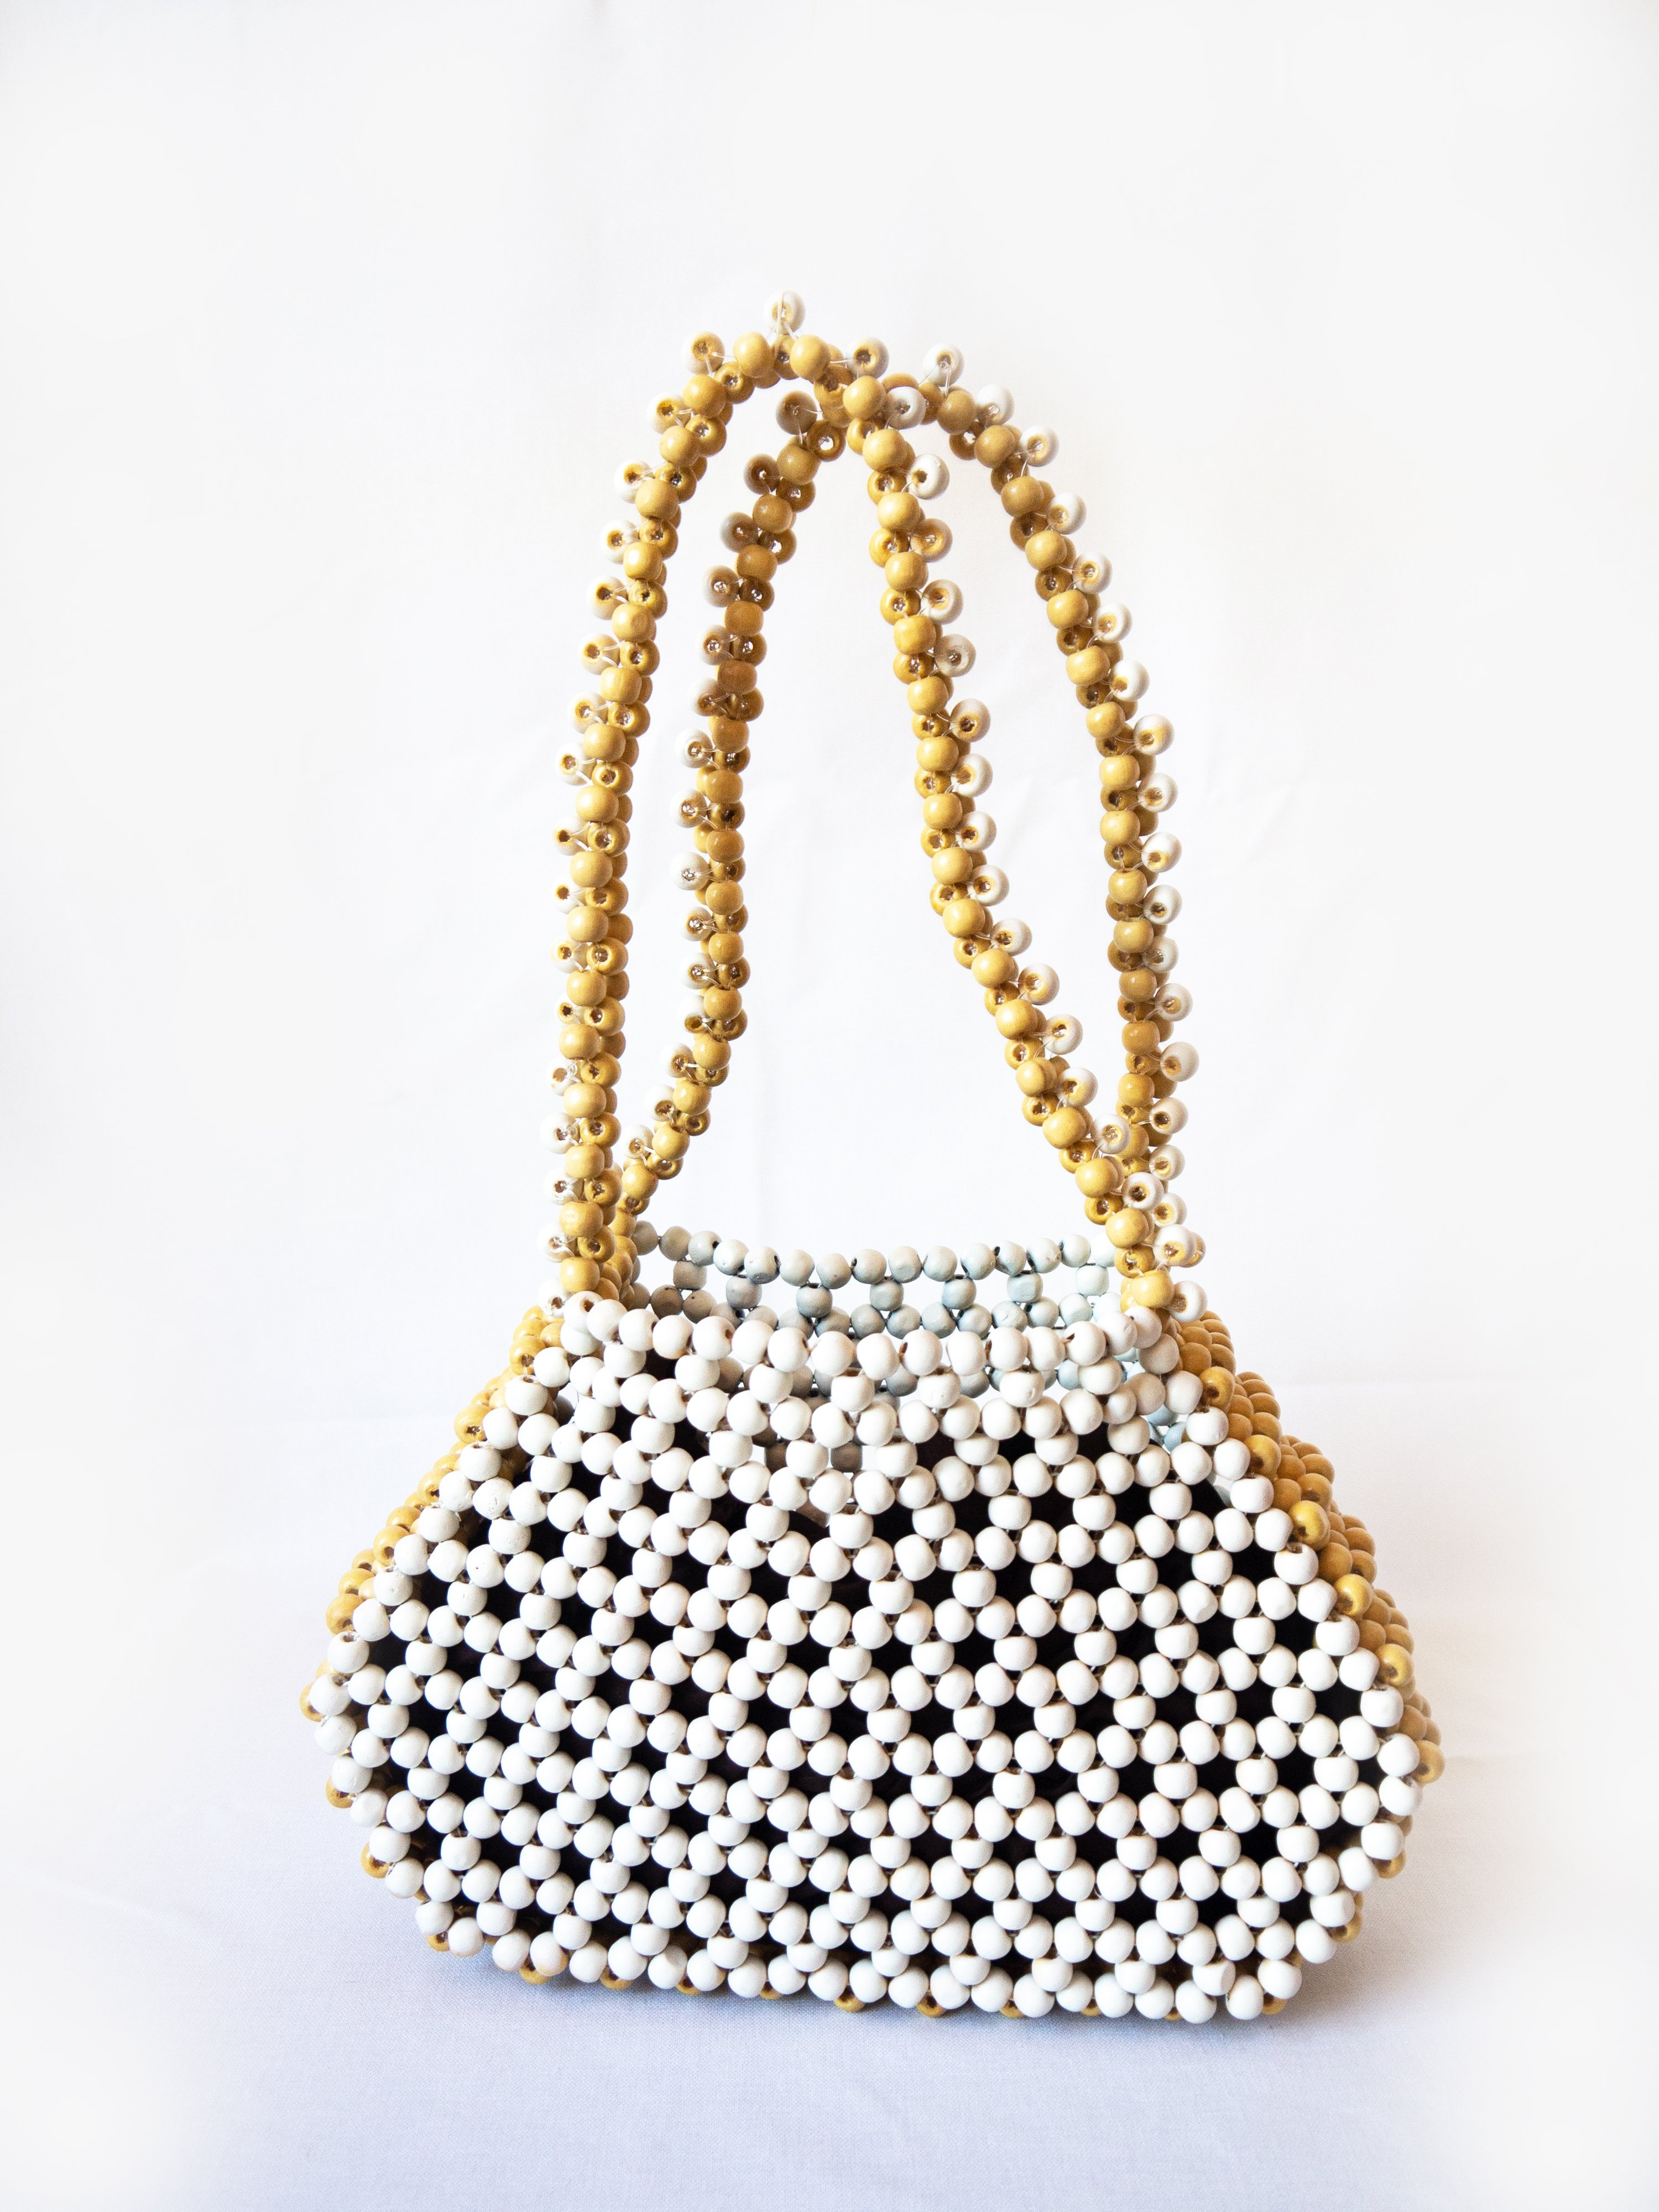 EDAS x Cameron Tea, Untitled, handmade beaded handbag